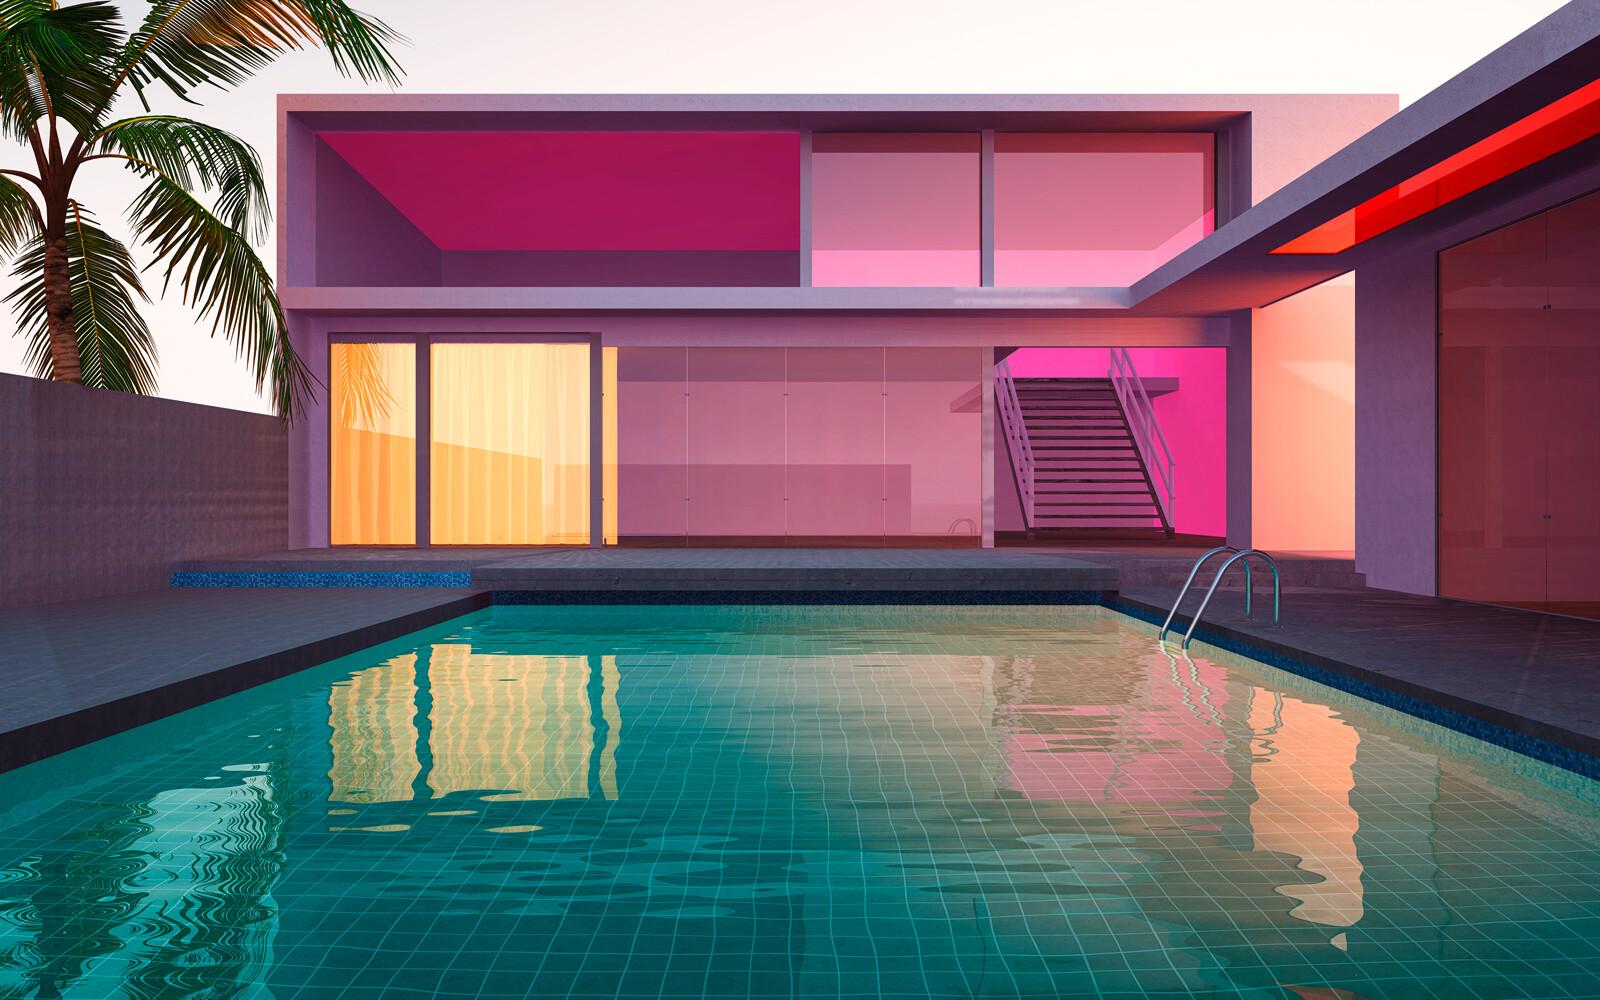 Pool 23 - Carl Miller